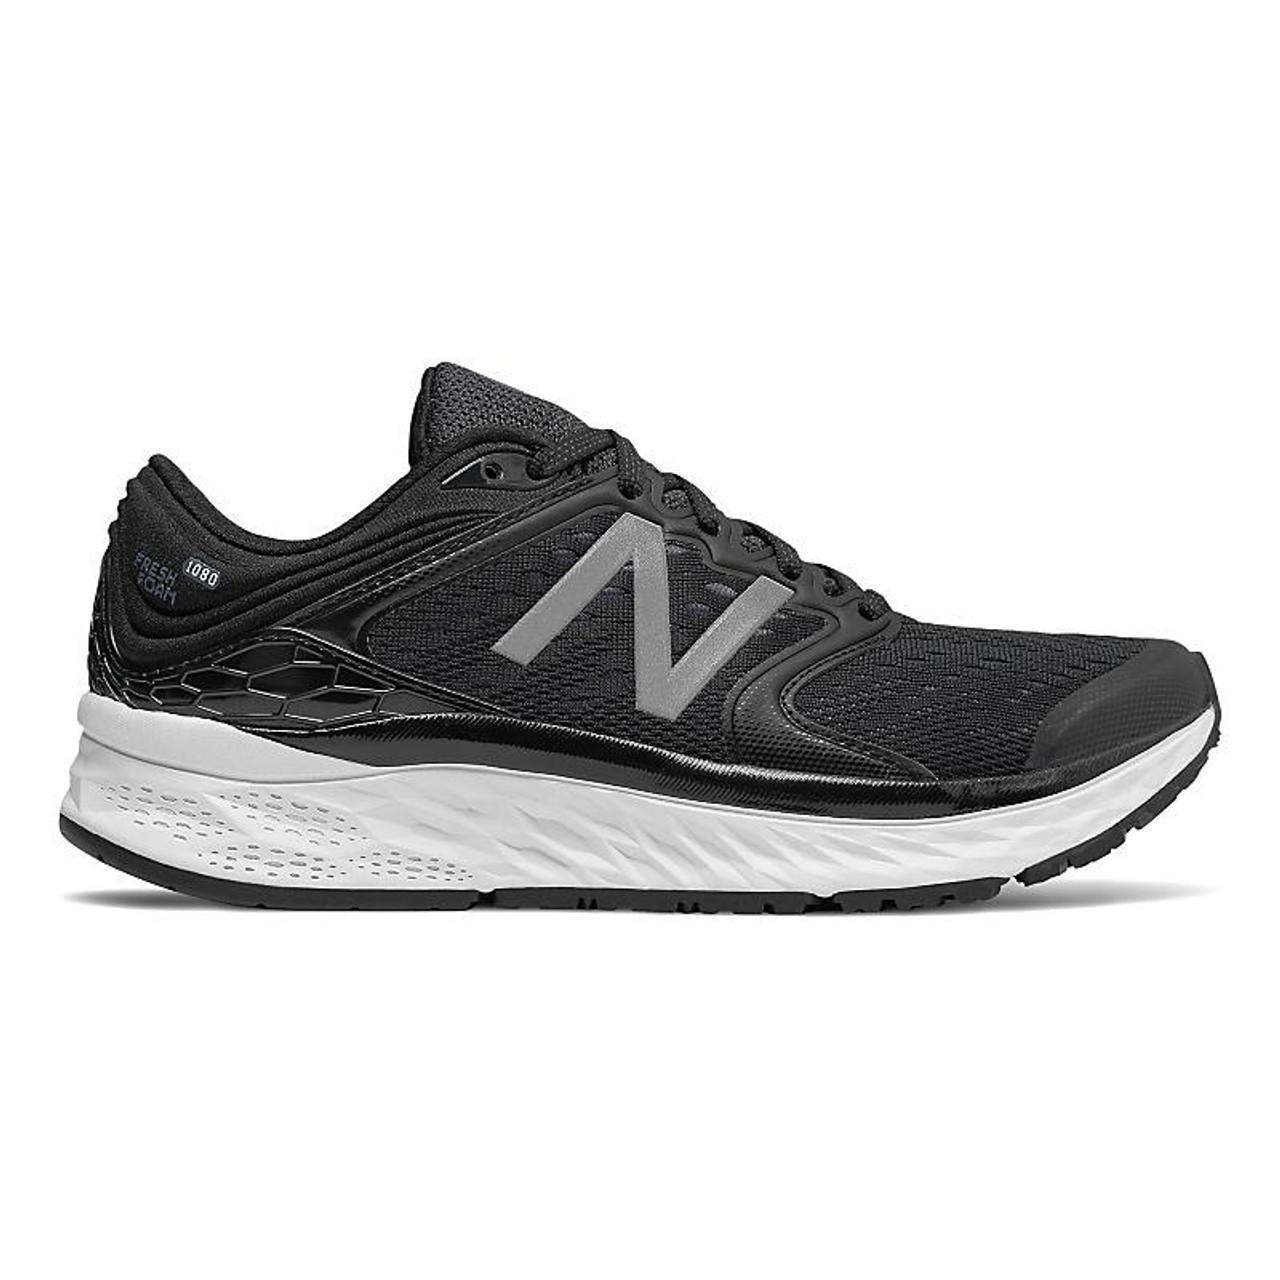 New Balance Fresh Foam 1080v8 Shoe